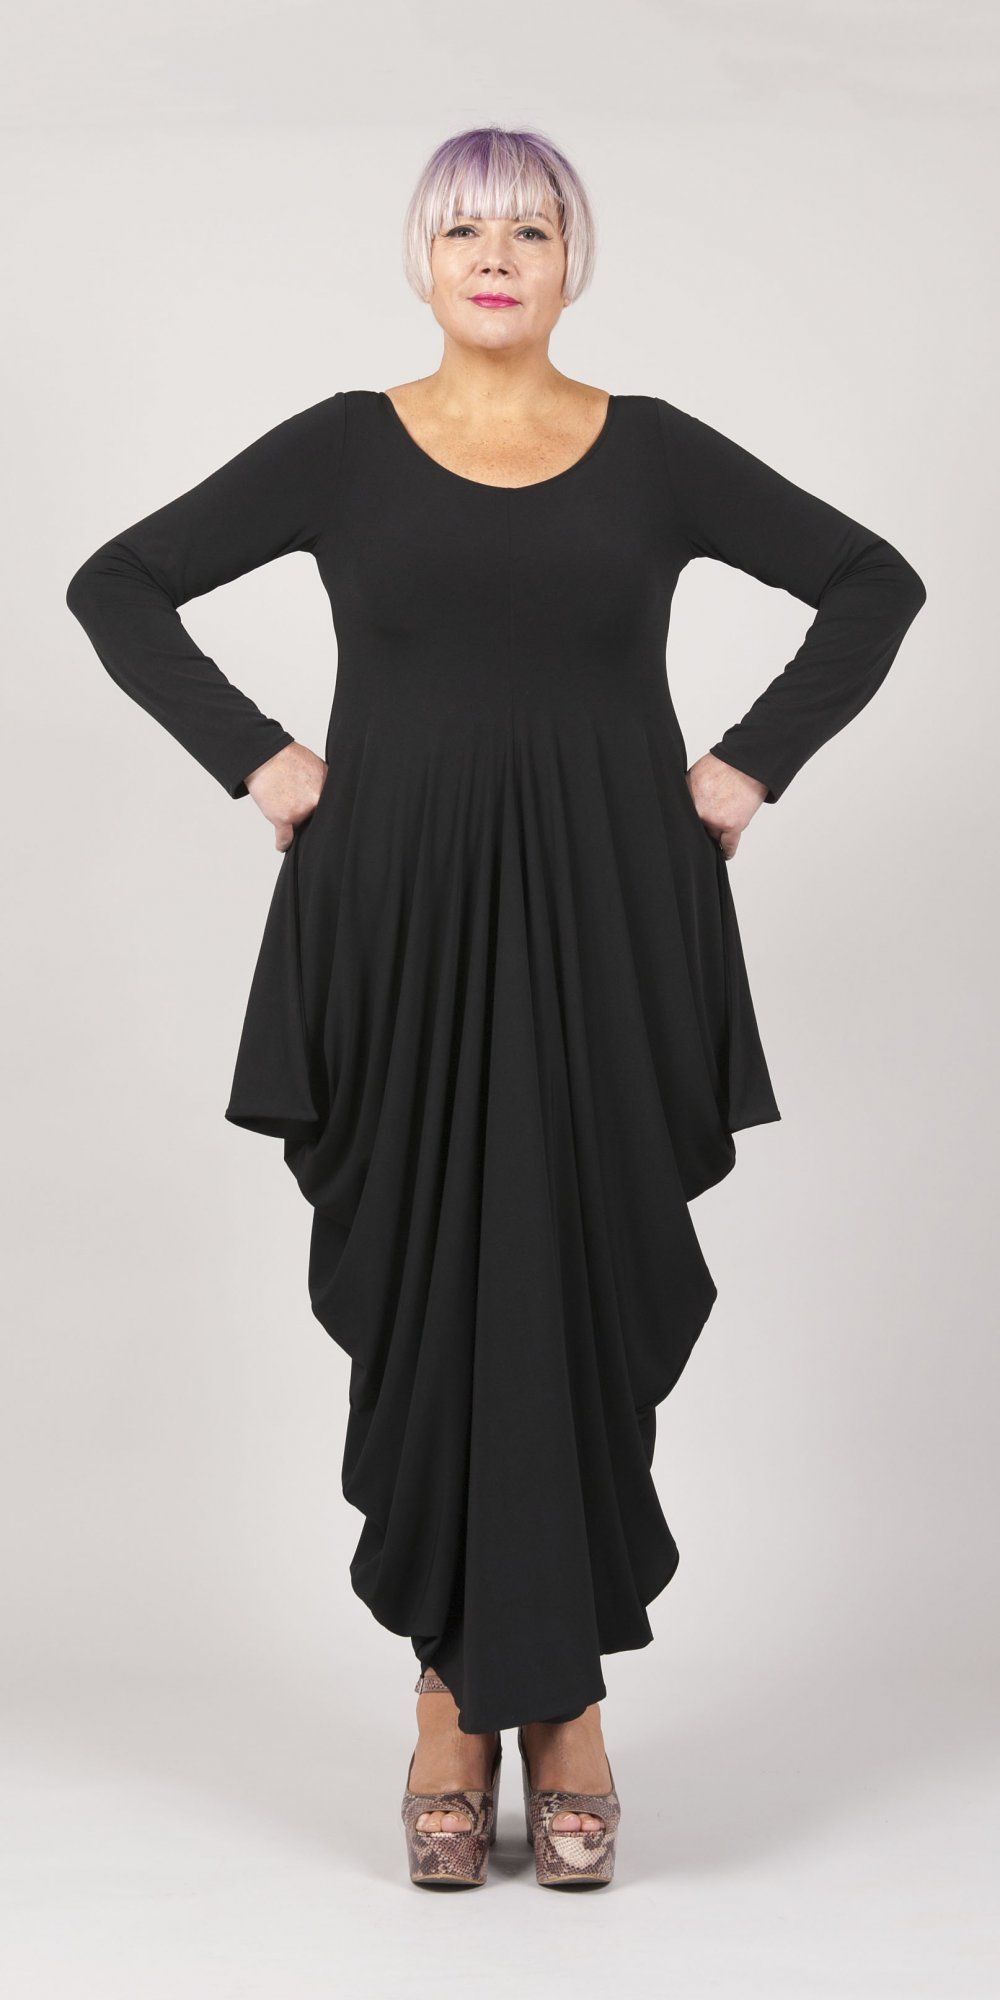 Mashiah Arrive Black Statement Occasion Dress | LAGENLOOK:MY STYLE ...